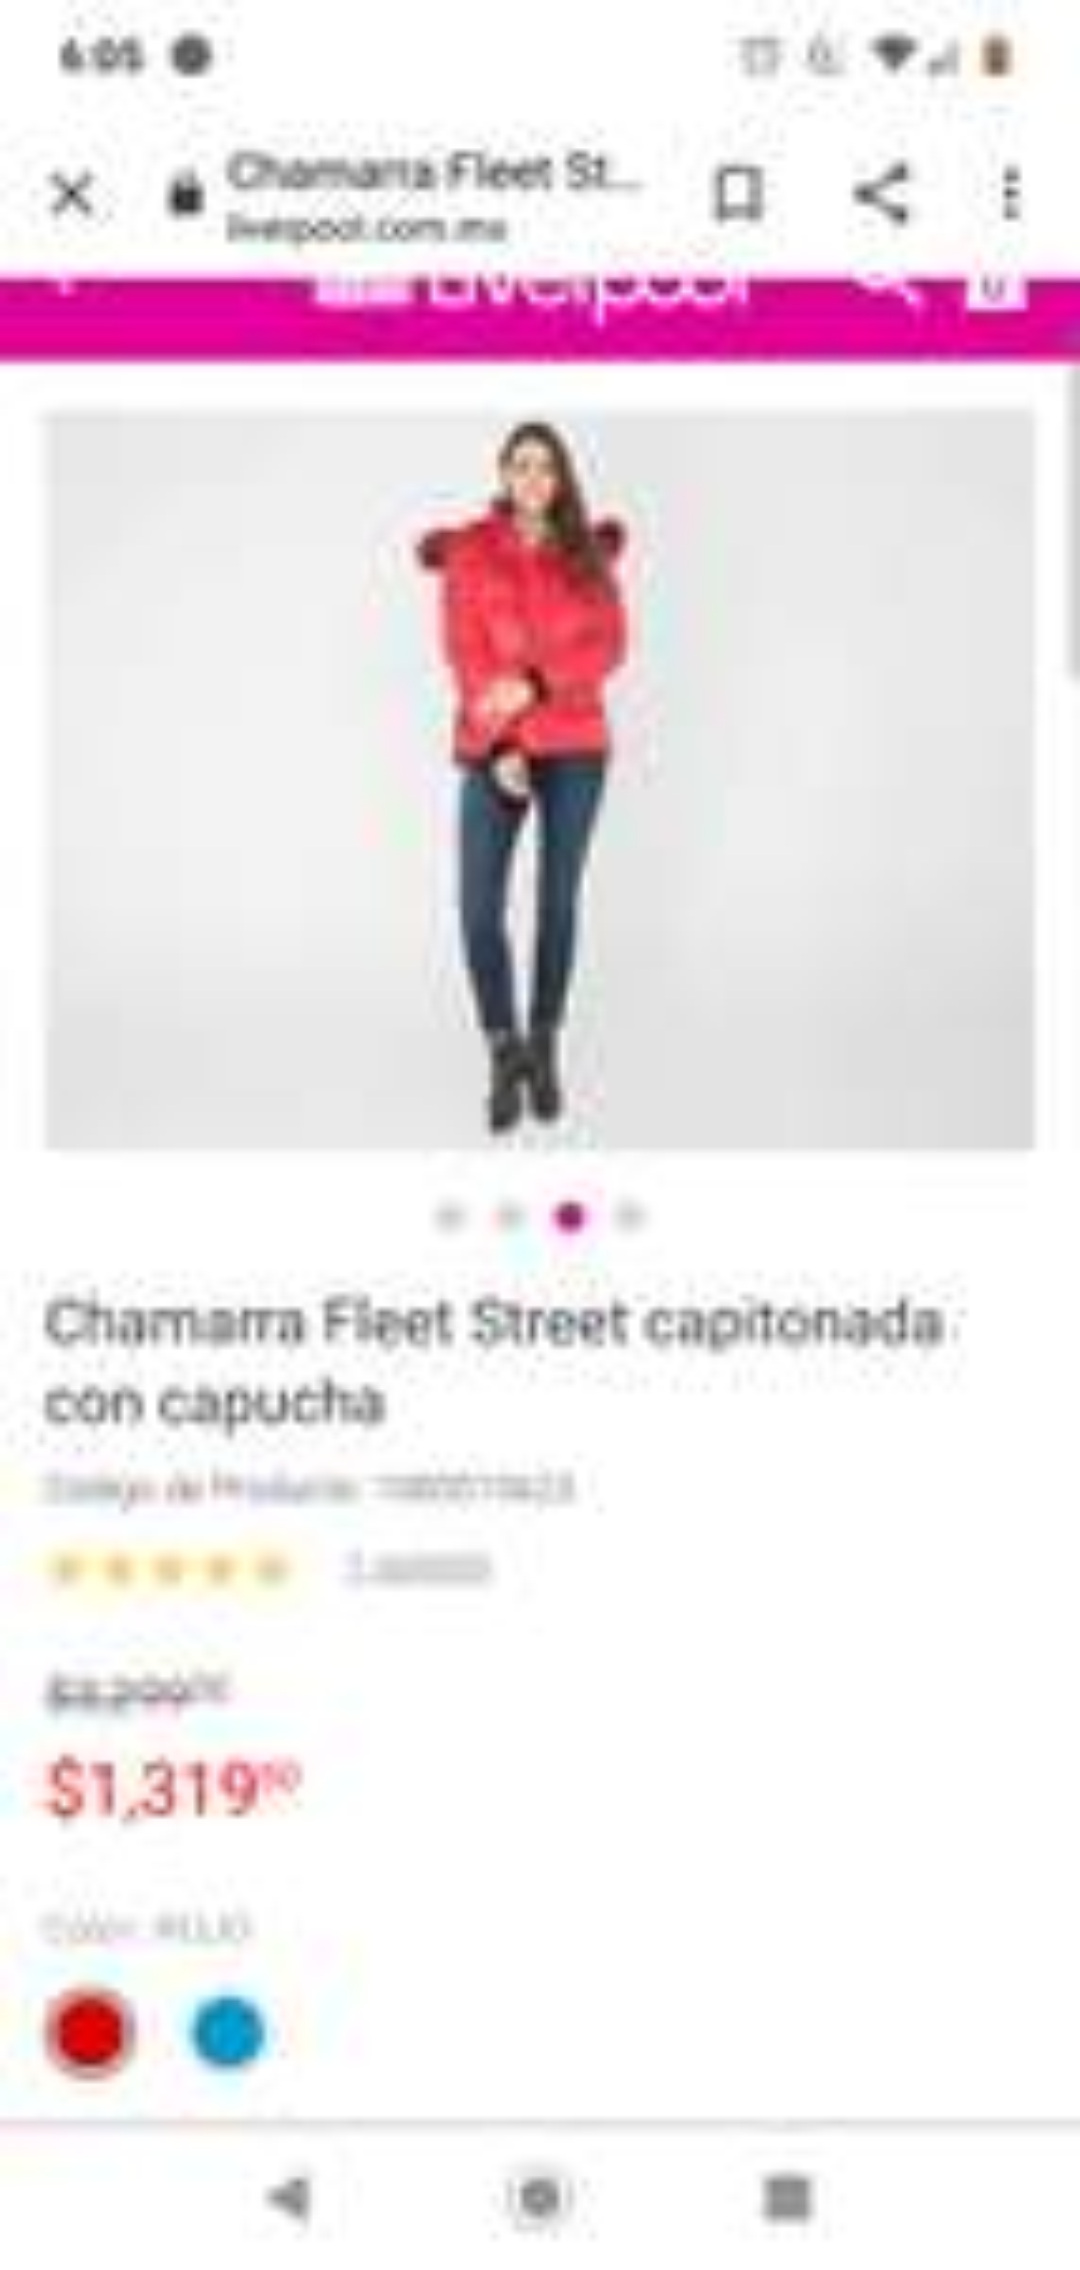 Liverpool: Chamarra Fleet Street capitonada con capucha